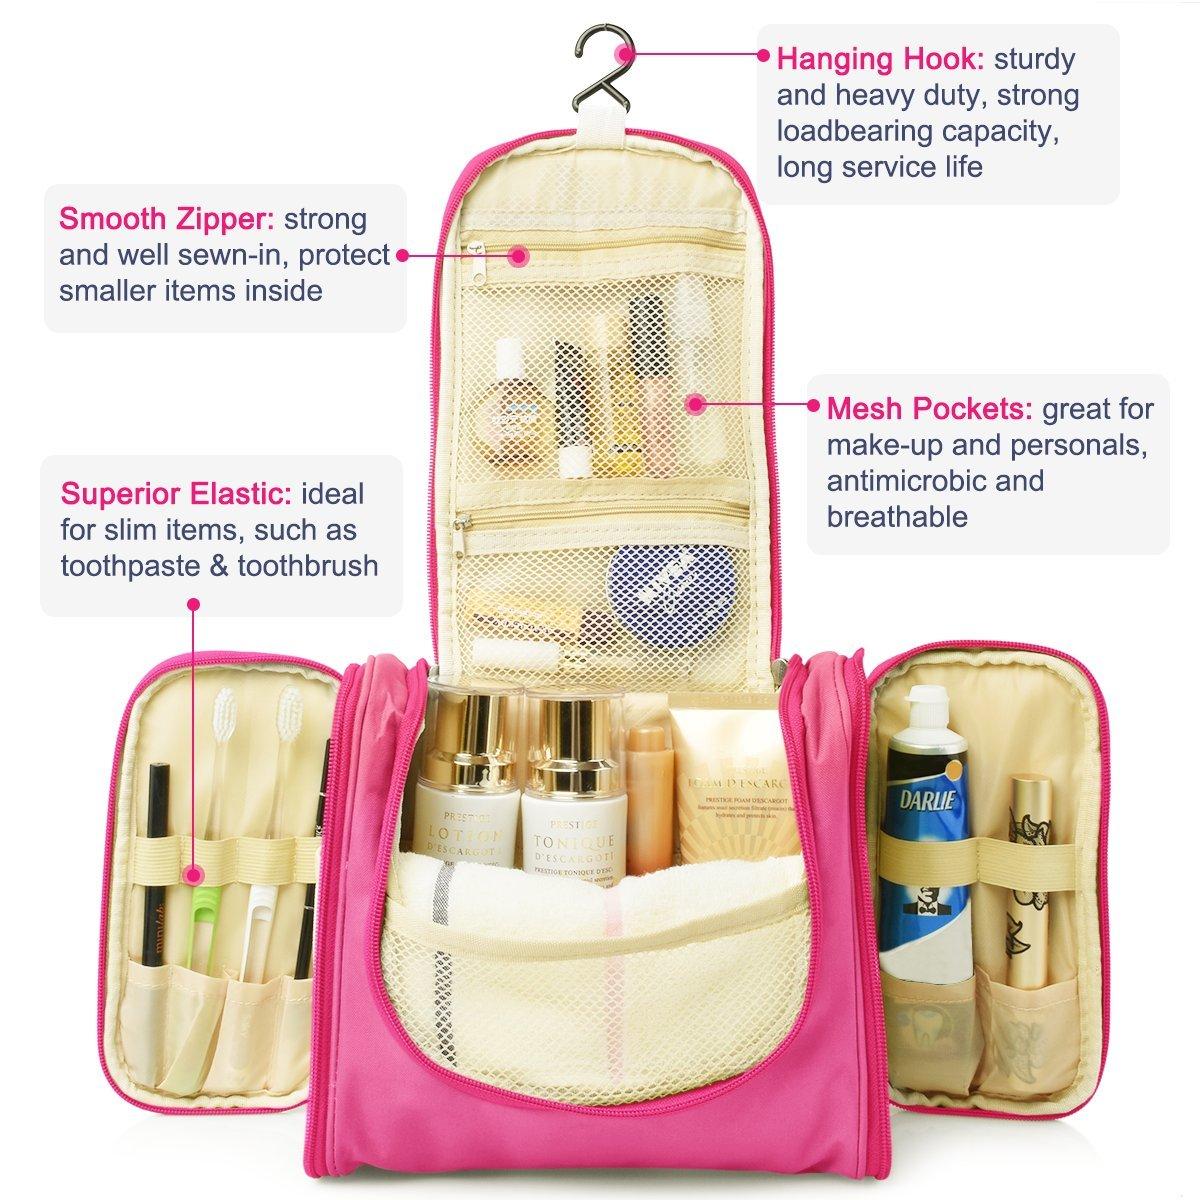 Heavy Duty Waterproof Hanging Toiletry Bag Travel Cosmetic Makeup Cosmetics Make Up Organizer For Women Shaving Kit